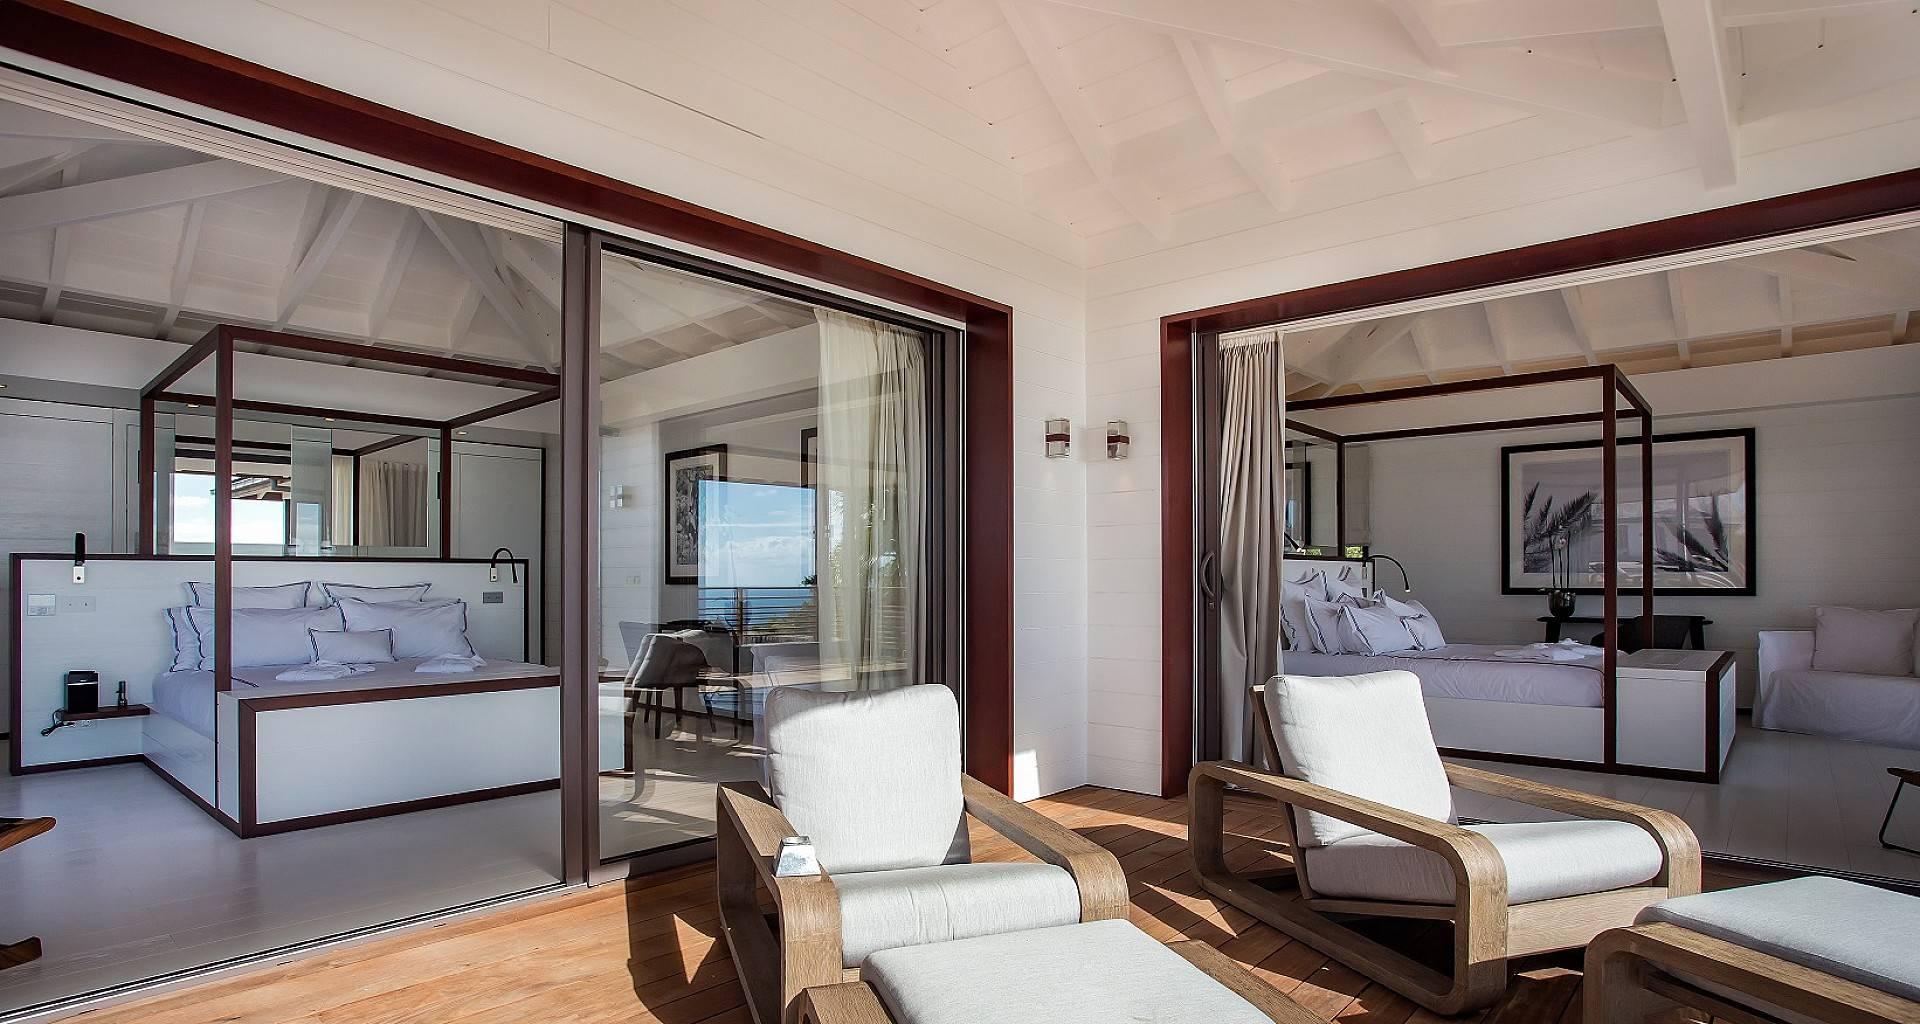 Villa Maison Blanc Bleu Bedroom 6